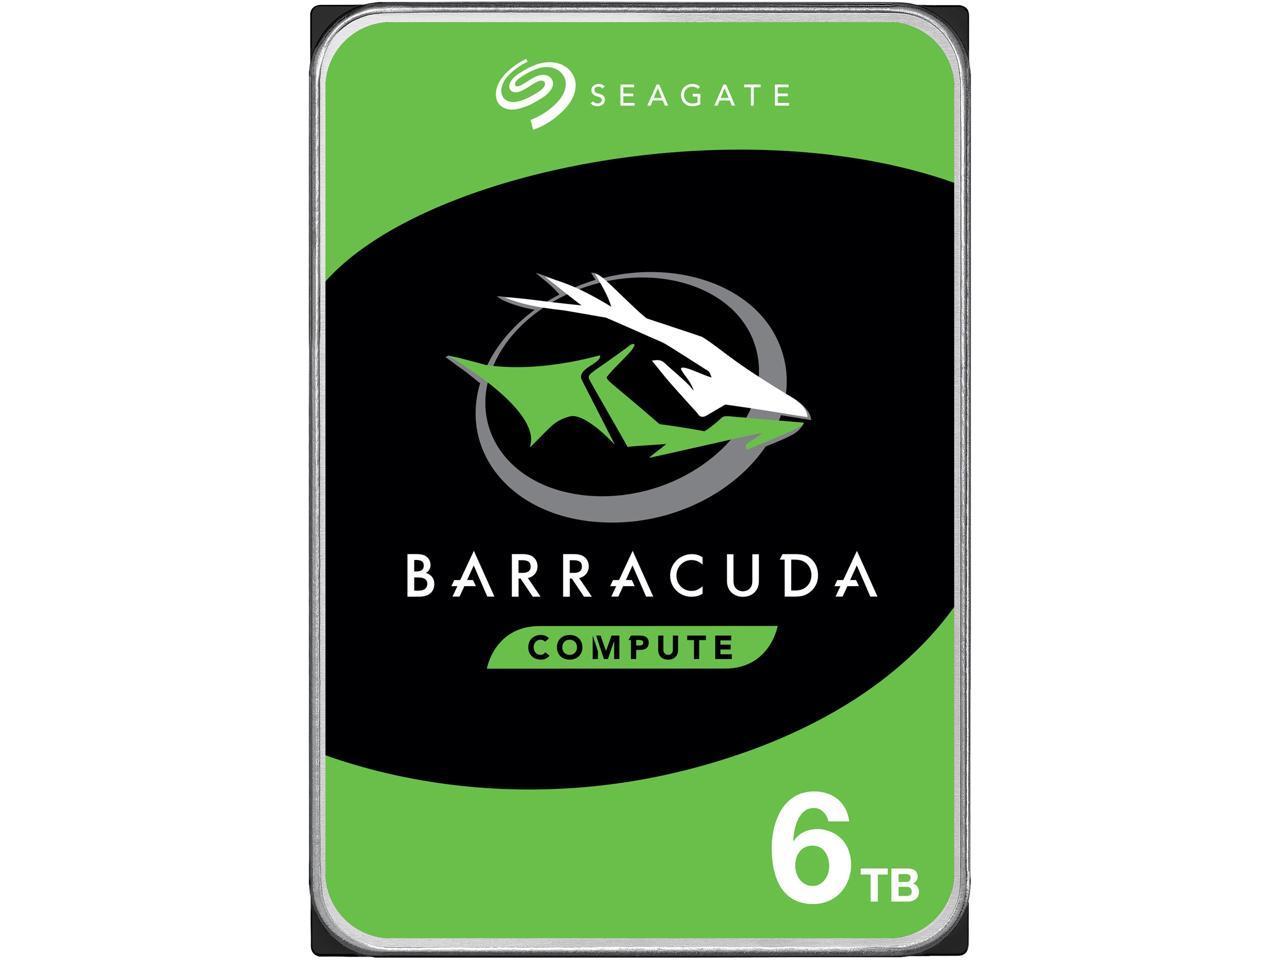 "Seagate BarraCuda 6TB 5400 RPM 256MB Cache SATA 6.0Gb/s 3.5"" Internal Hard Drive ST6000DM003 $109.99 + FS"